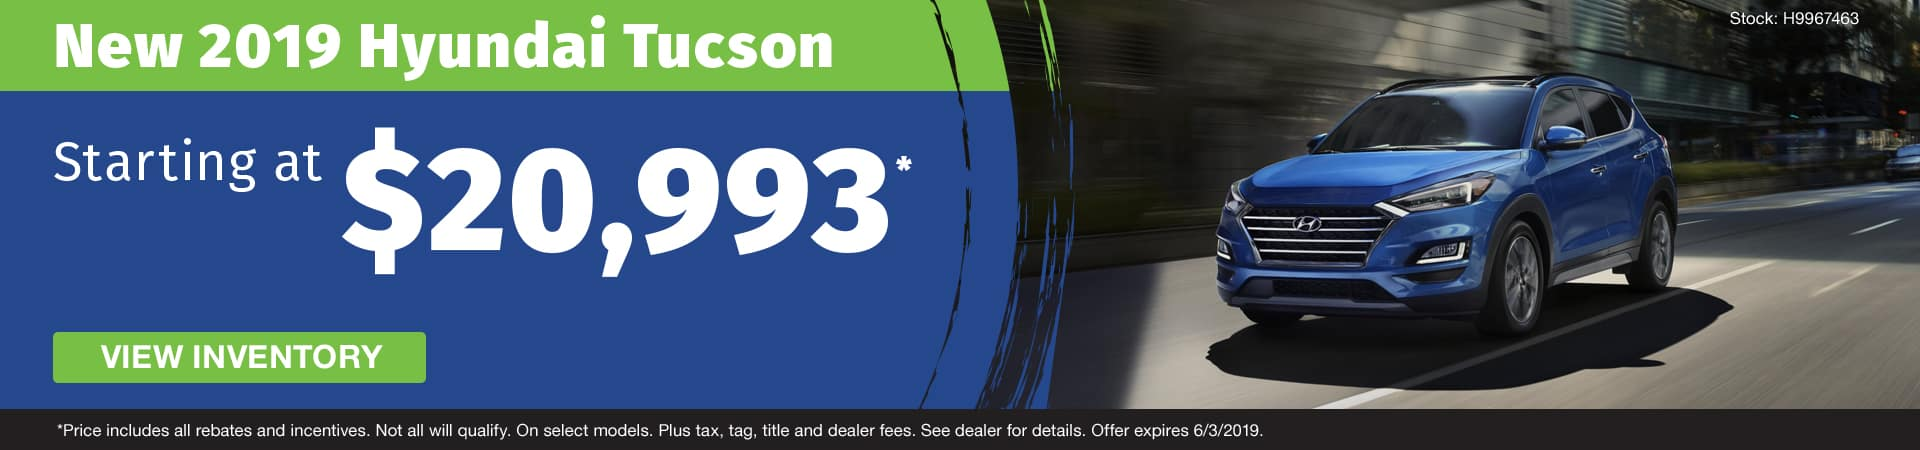 Get a new 2019 Hyundai Tucson starting at $20,993 in Murfreesboro TN